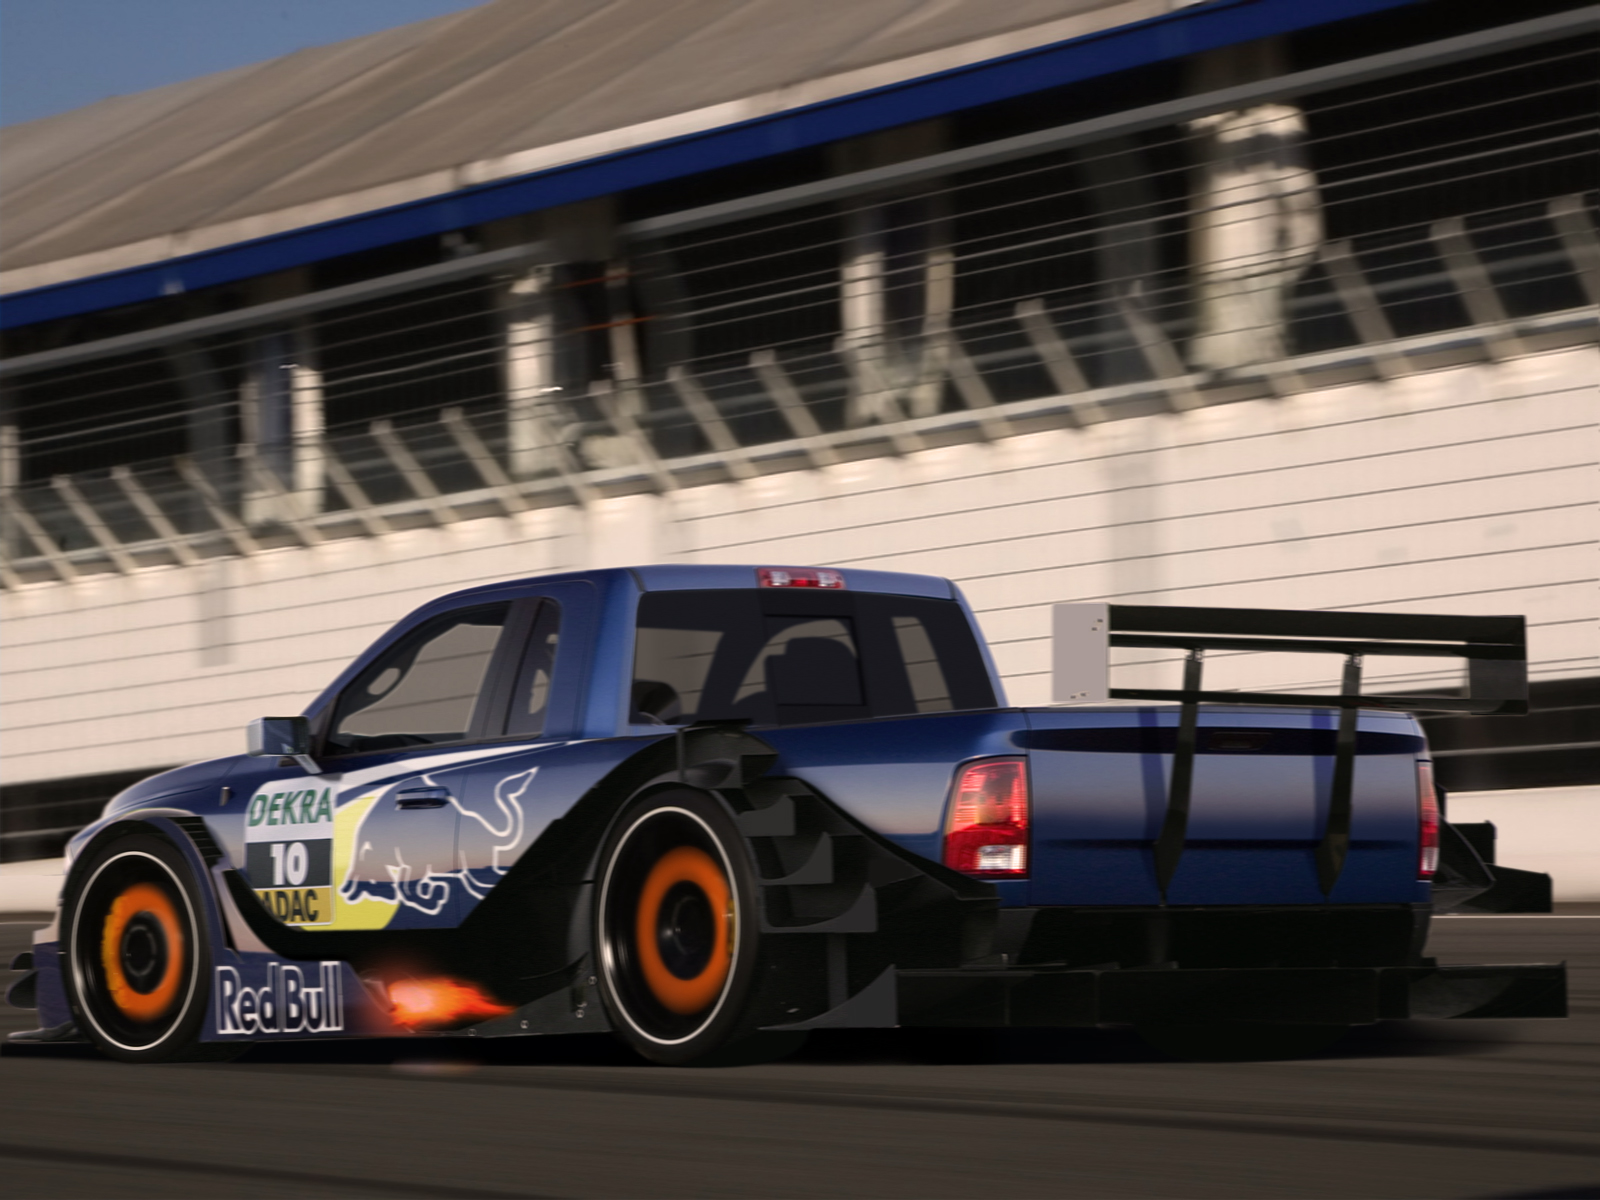 Dodge Ram Racing by degraafm